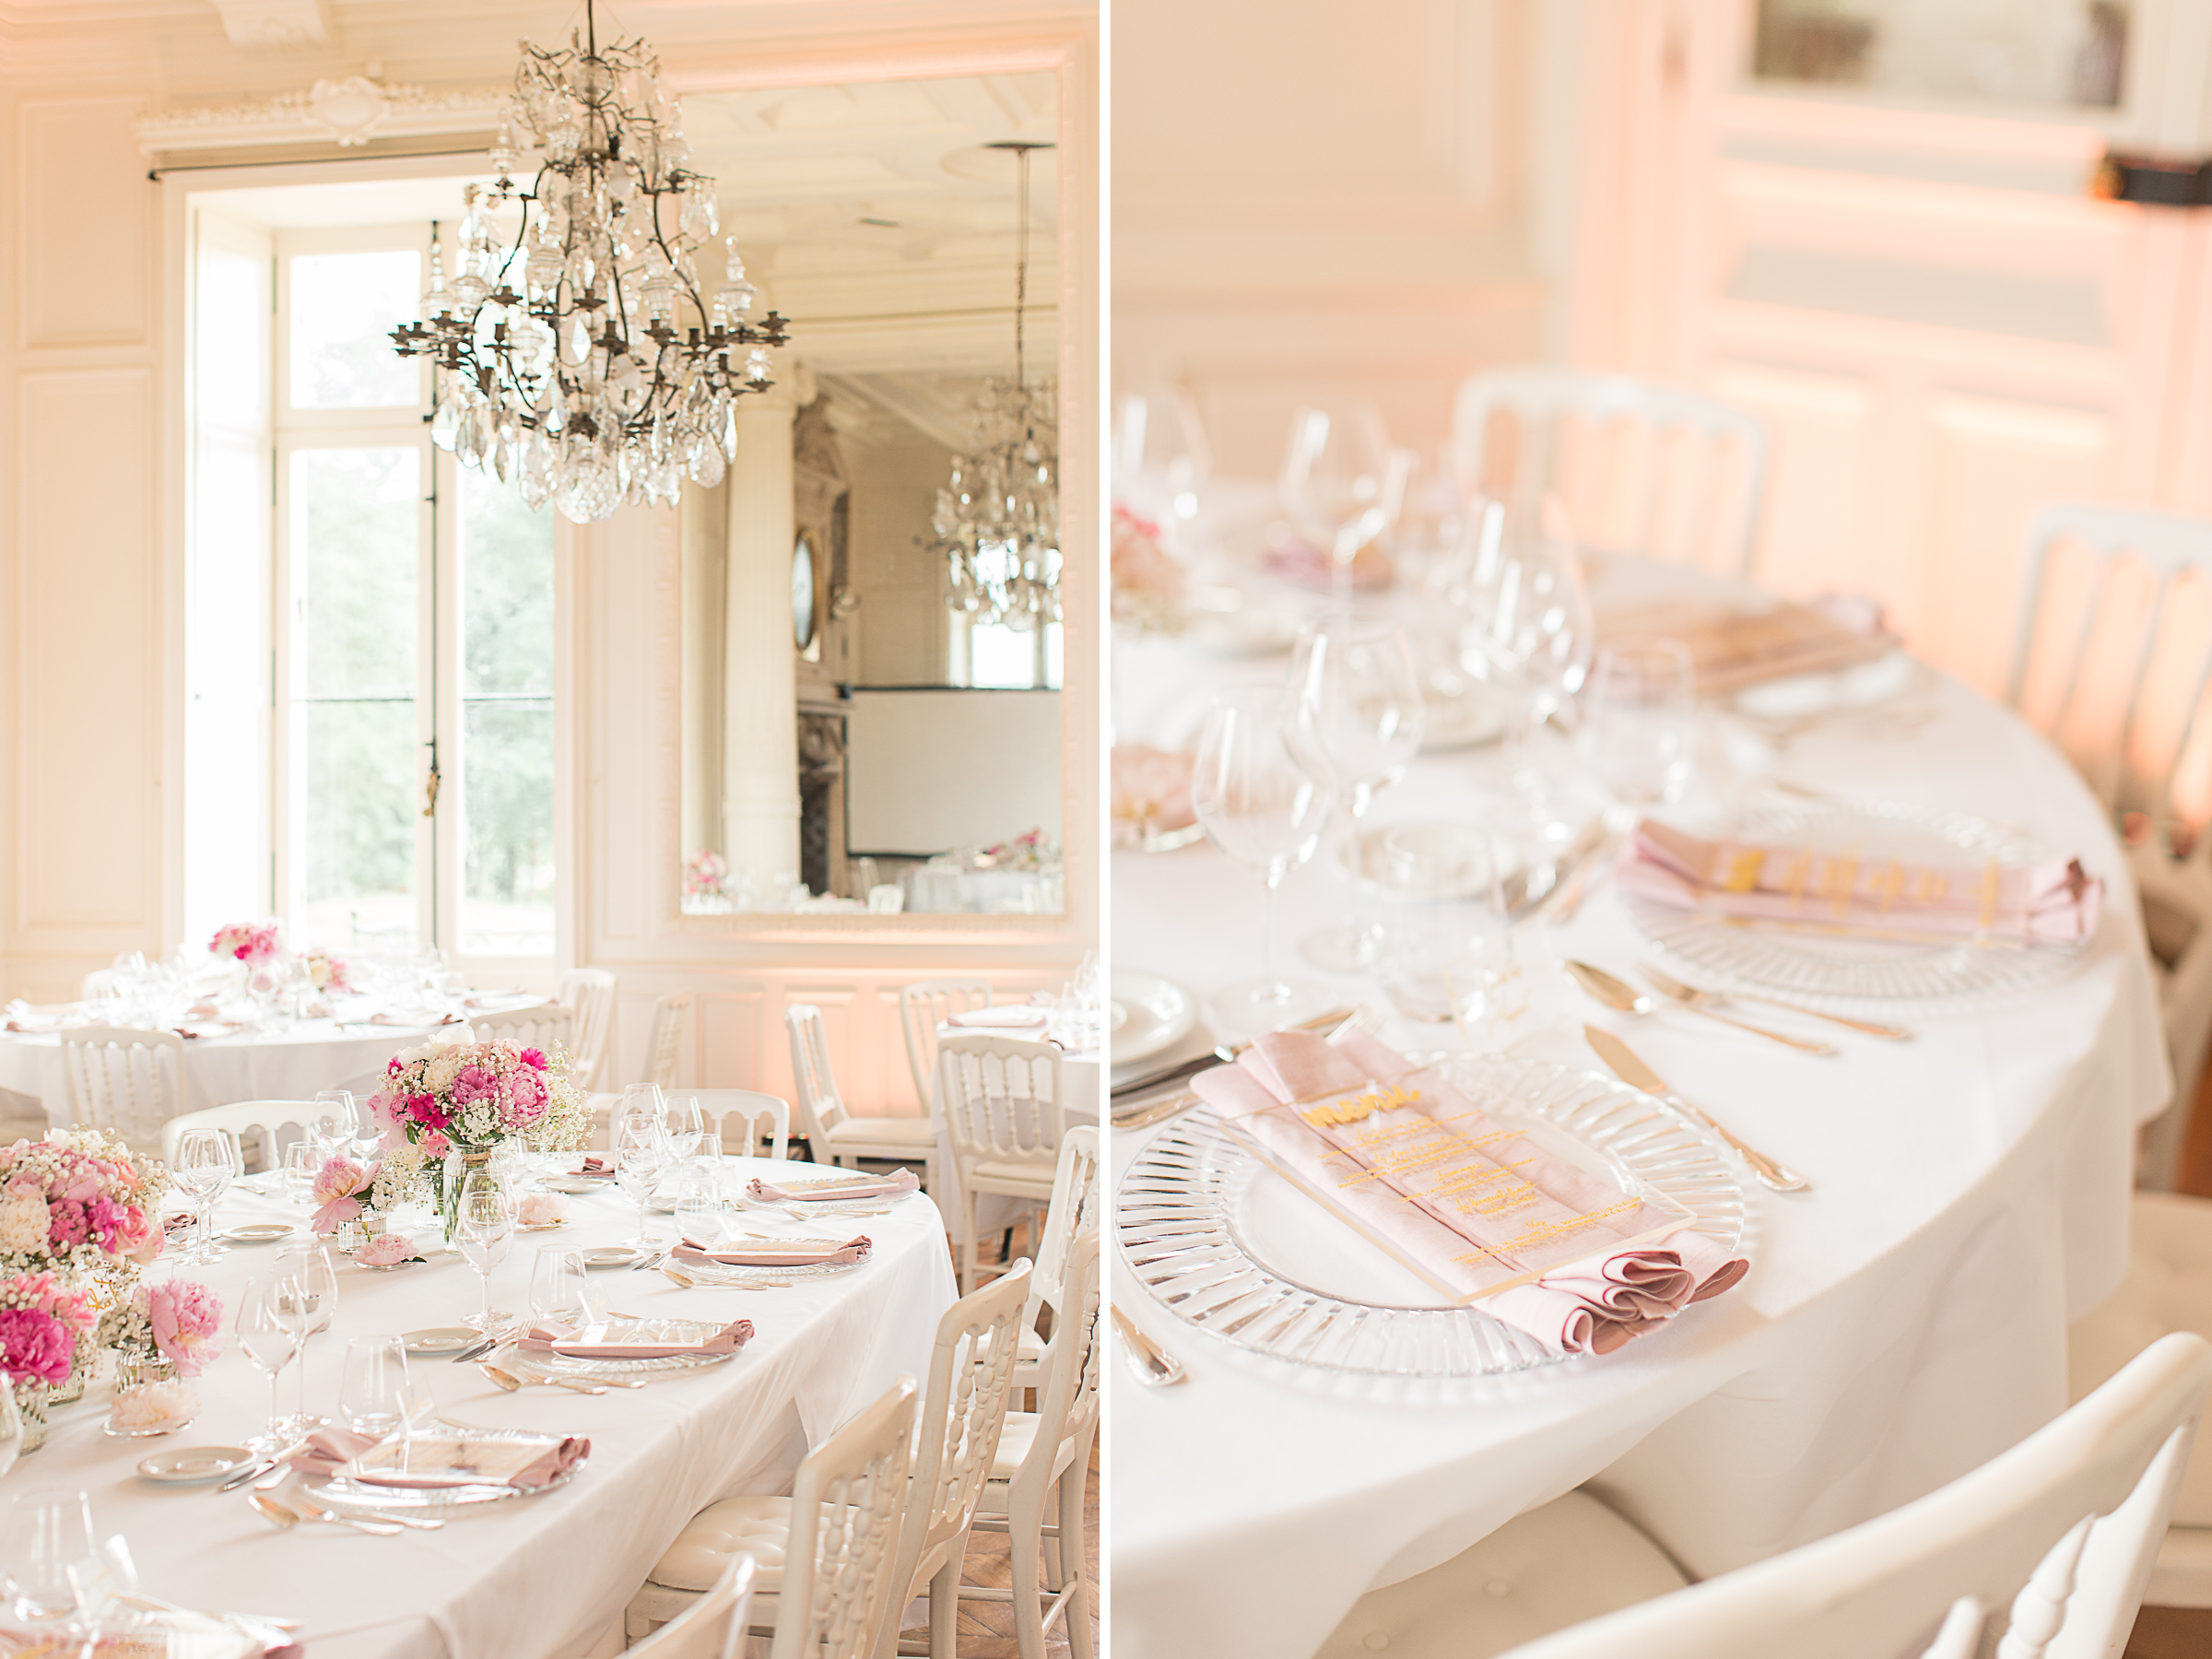 Wedding design chic and elegant in france